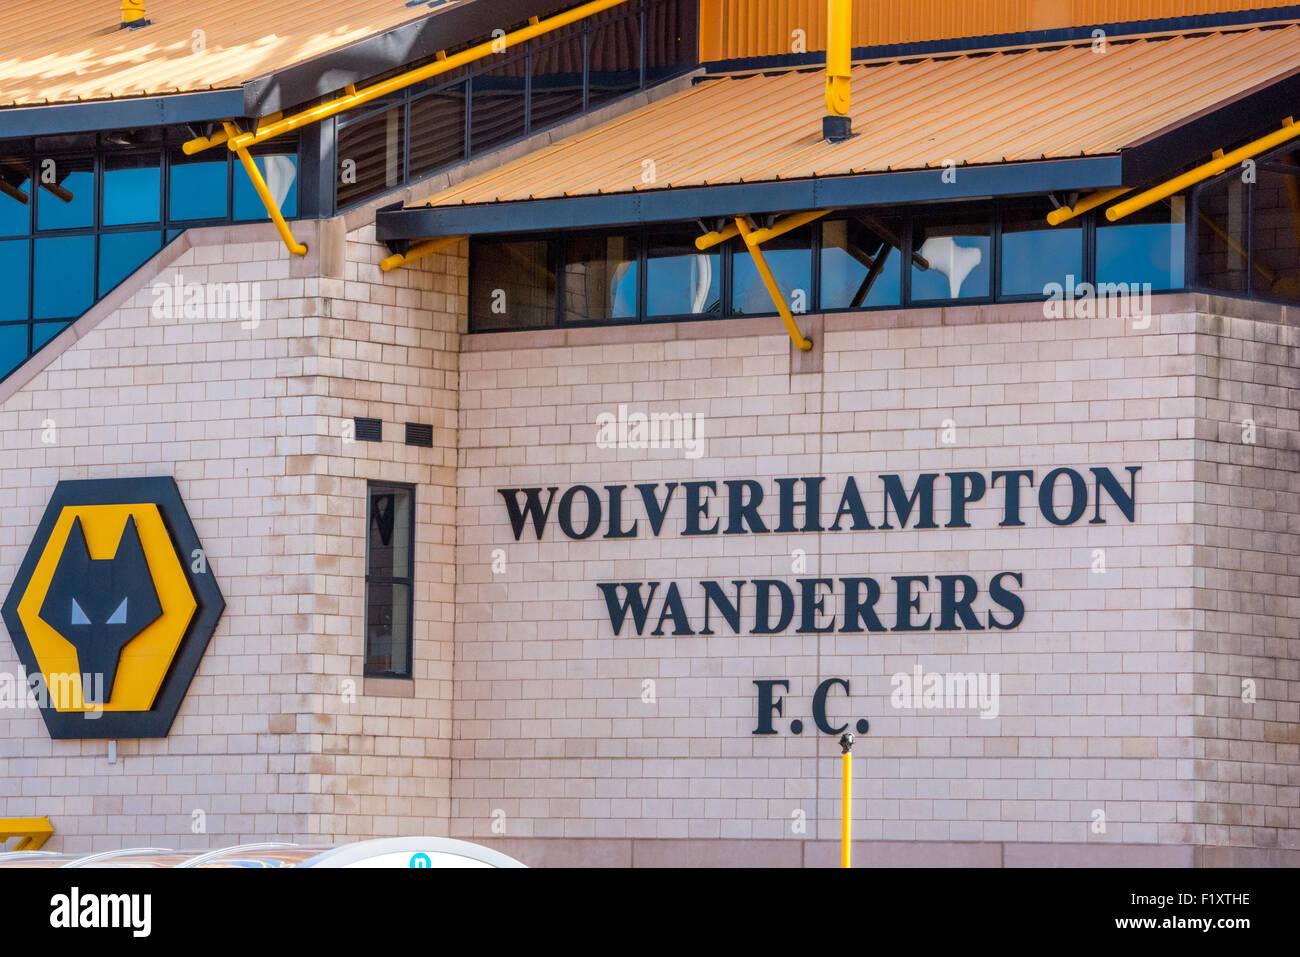 Wolverhampton Wanderers Fc Molineux Ground Stock Photos